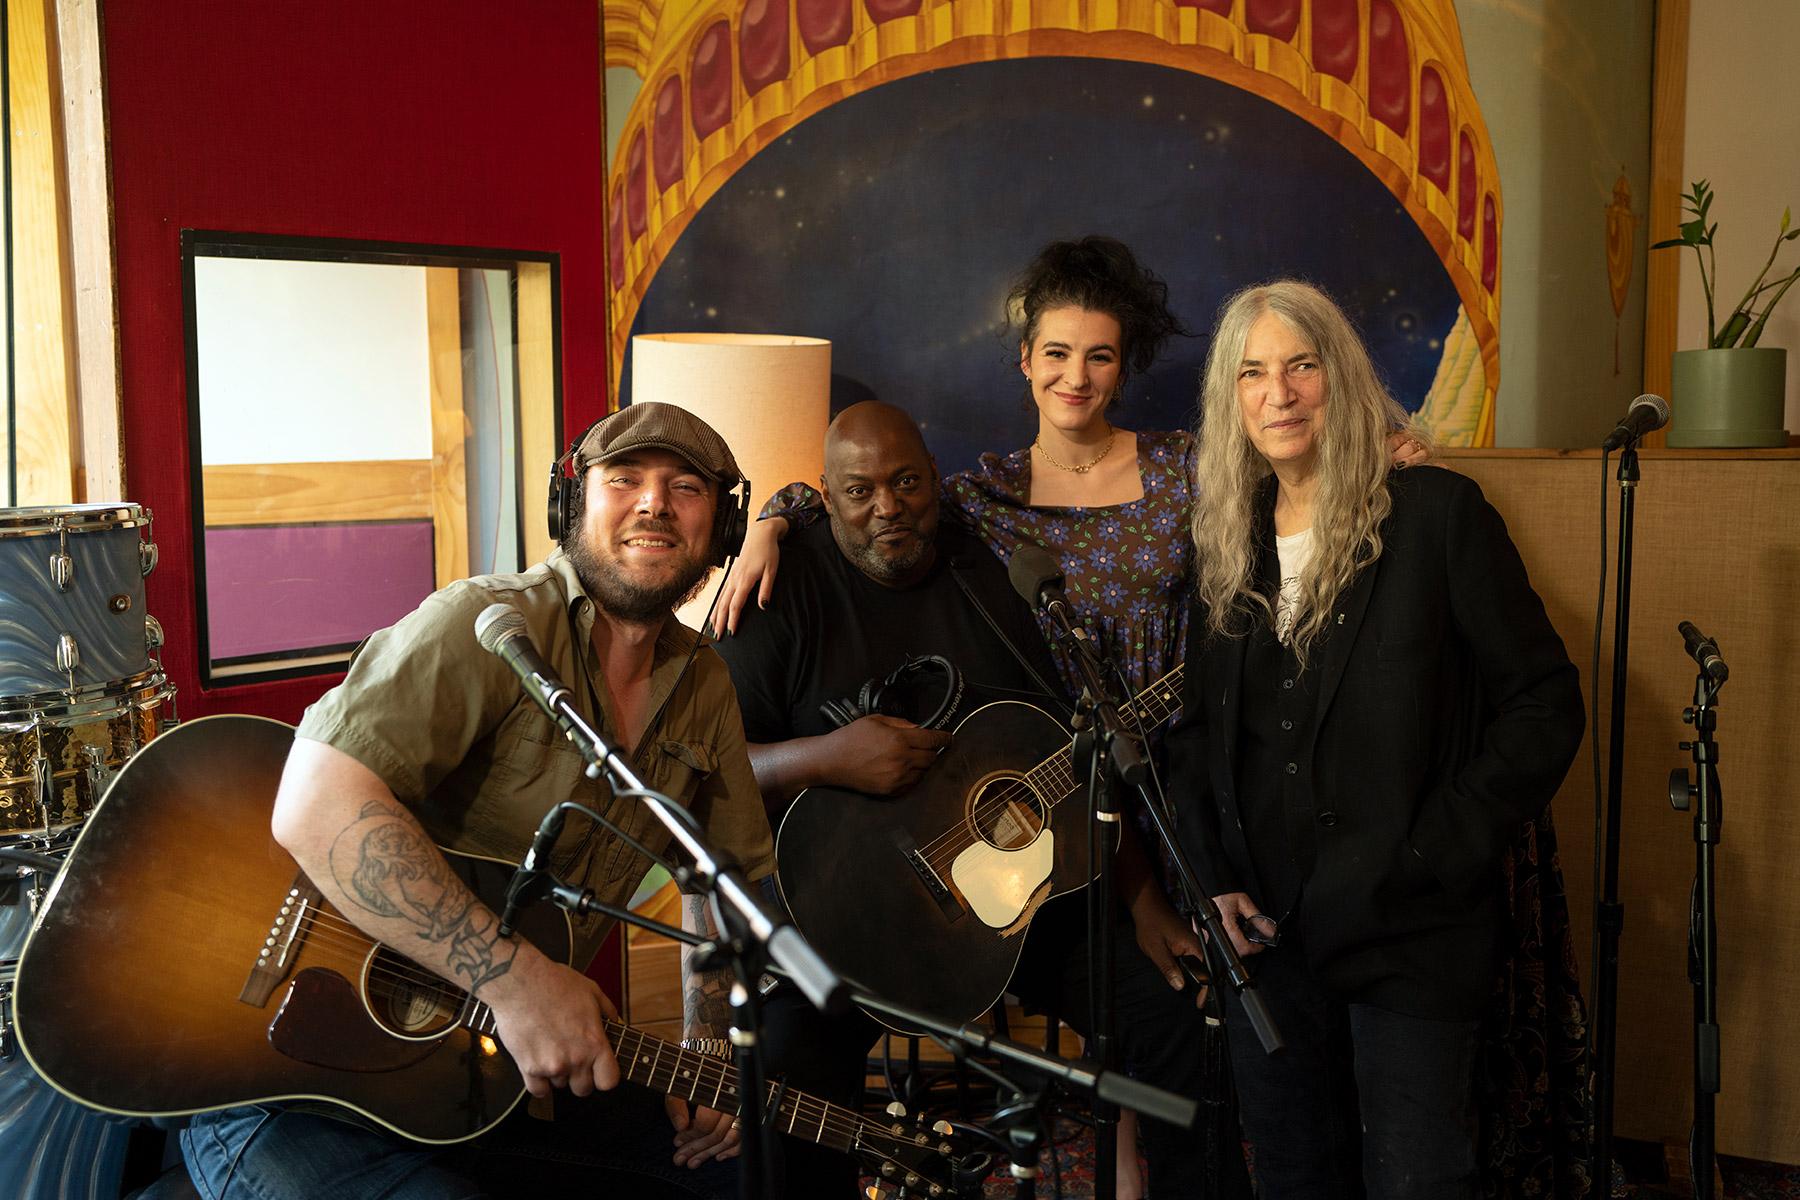 Jackson Smith, Tomás Doncker, Jesse Paris Smith and Patti Smith at Electric Lady Studios in New York.